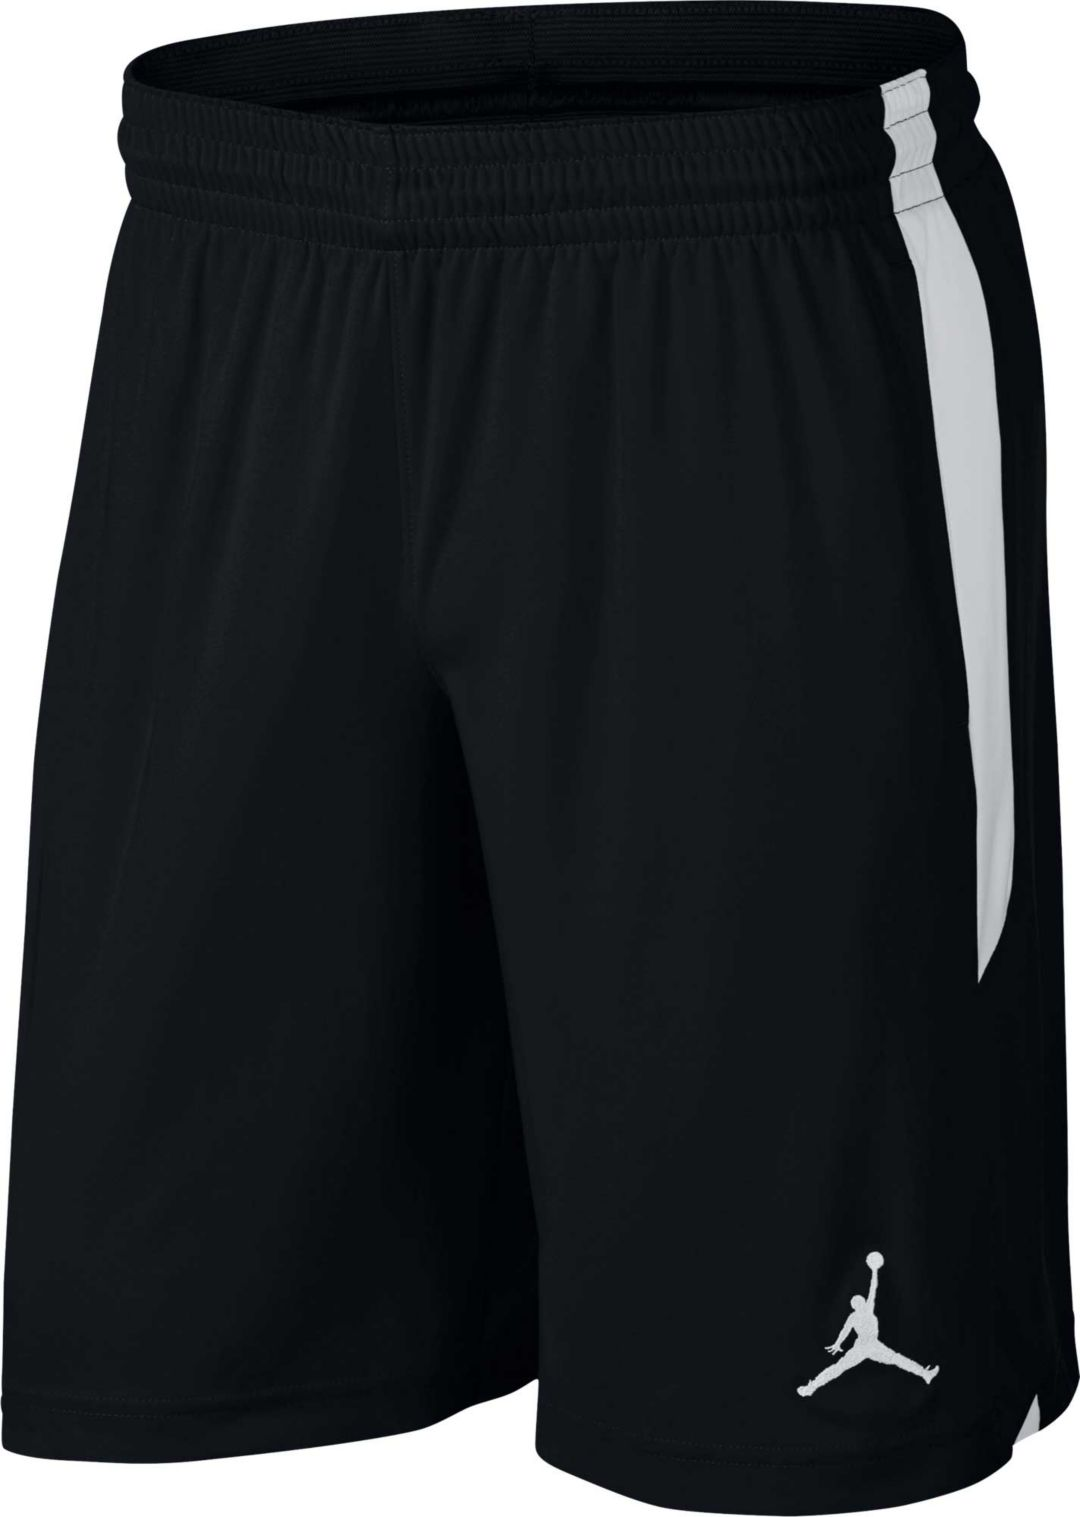 07d9b06ad429a Jordan Men's Dri-FIT 23 Alpha Training Shorts. noImageFound. Previous